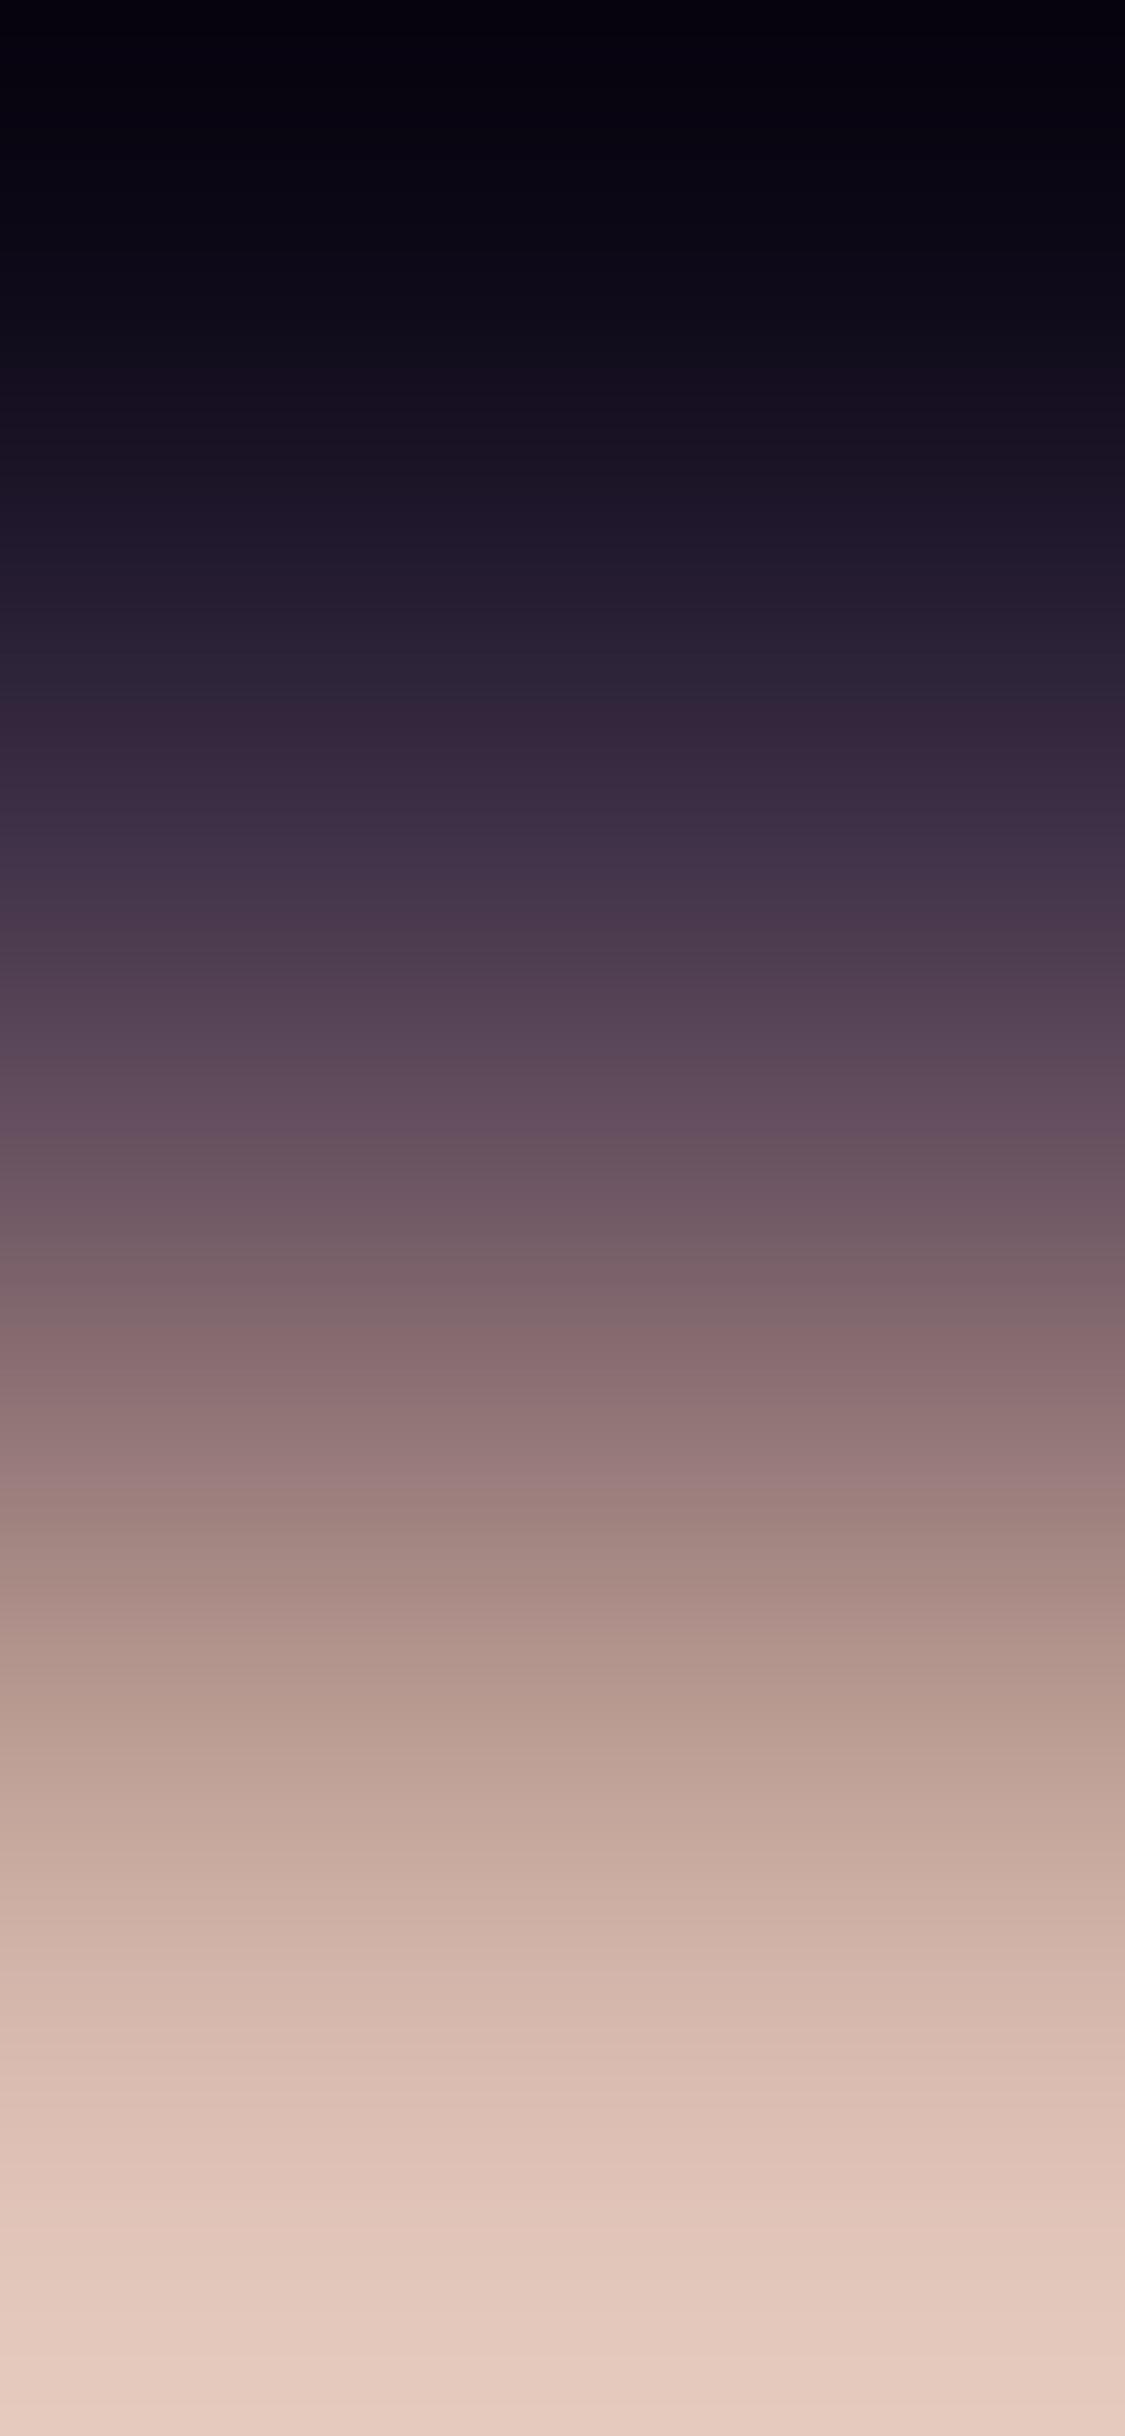 iPhoneXpapers.com-Apple-iPhone-wallpaper-sk87-purple-dawn-blur-gradation